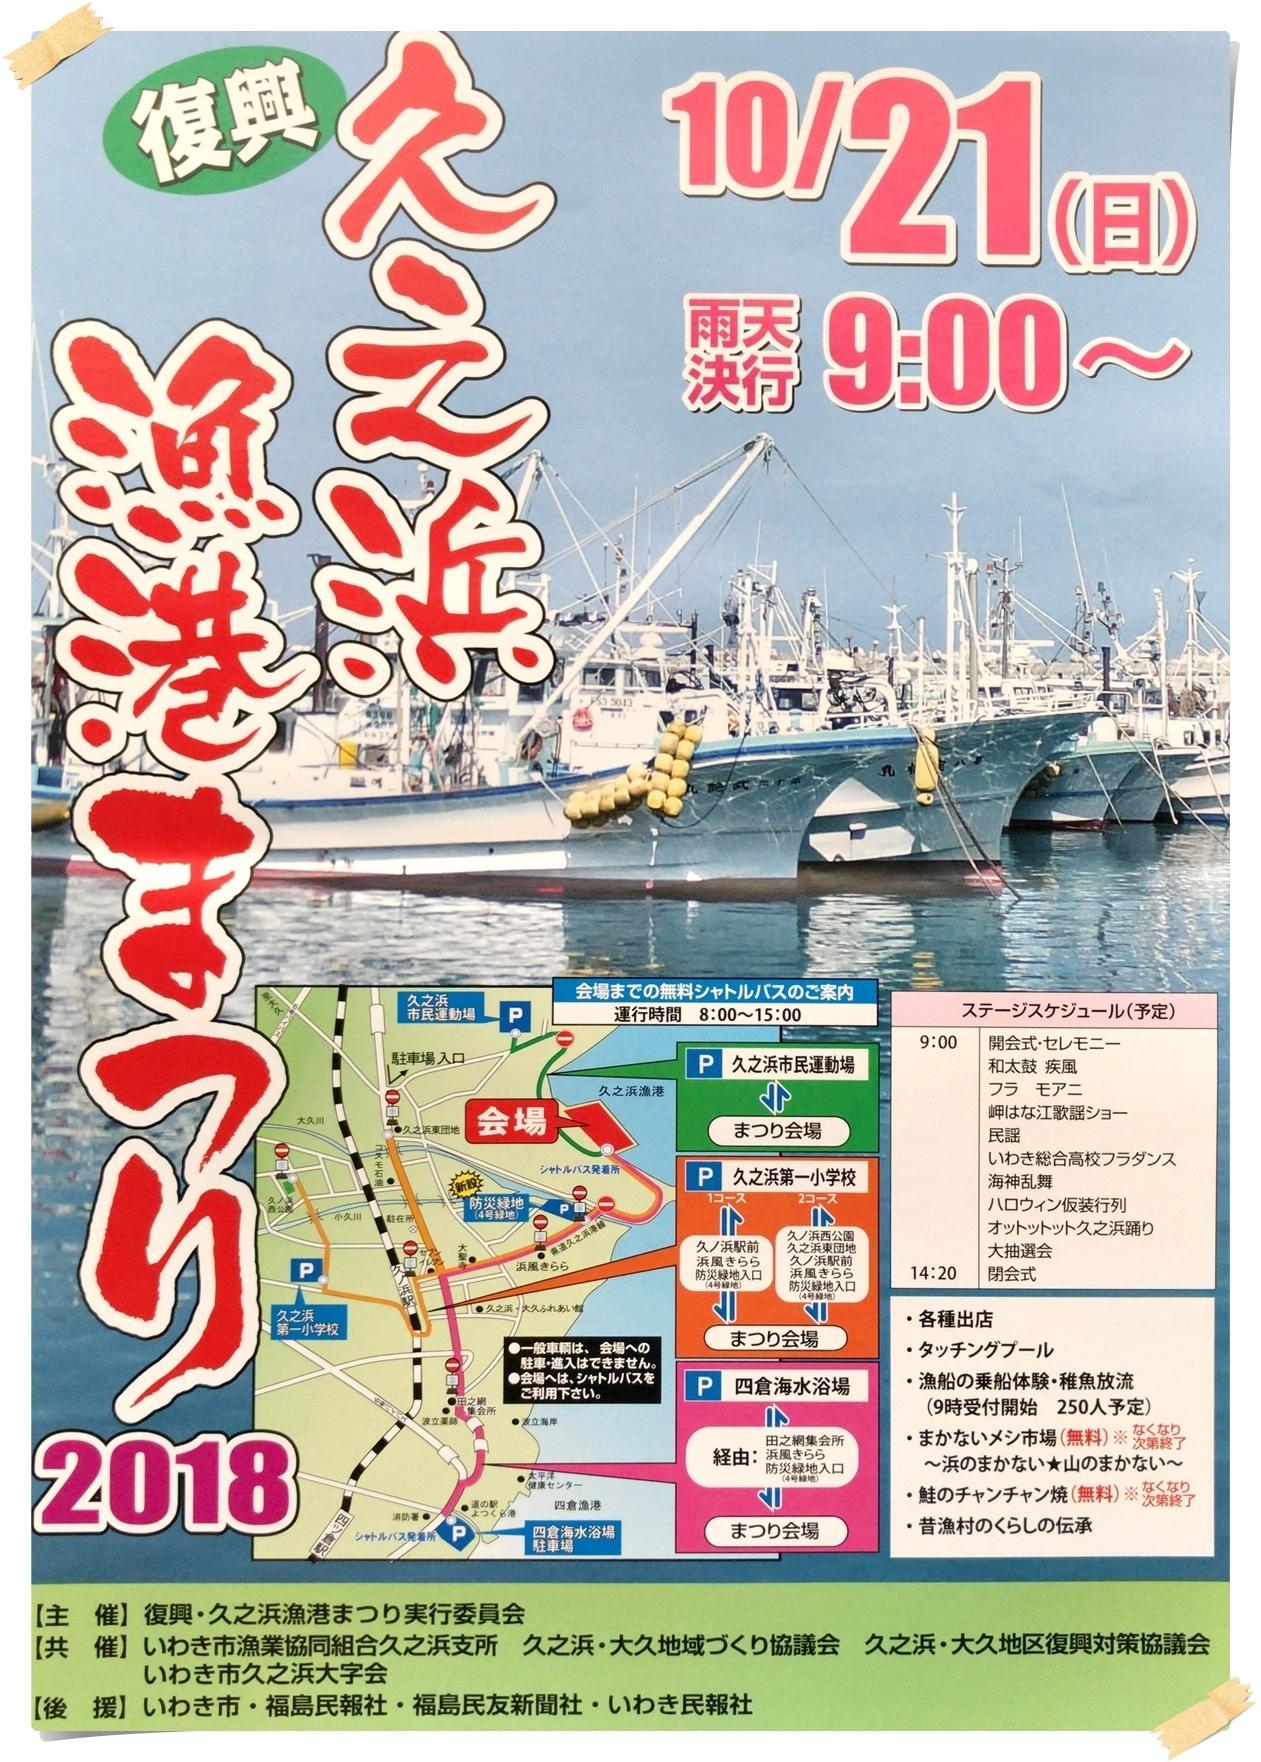 「復興・久之浜漁港まつり2018」今週末開催! [平成30年10月18日(木)更新]